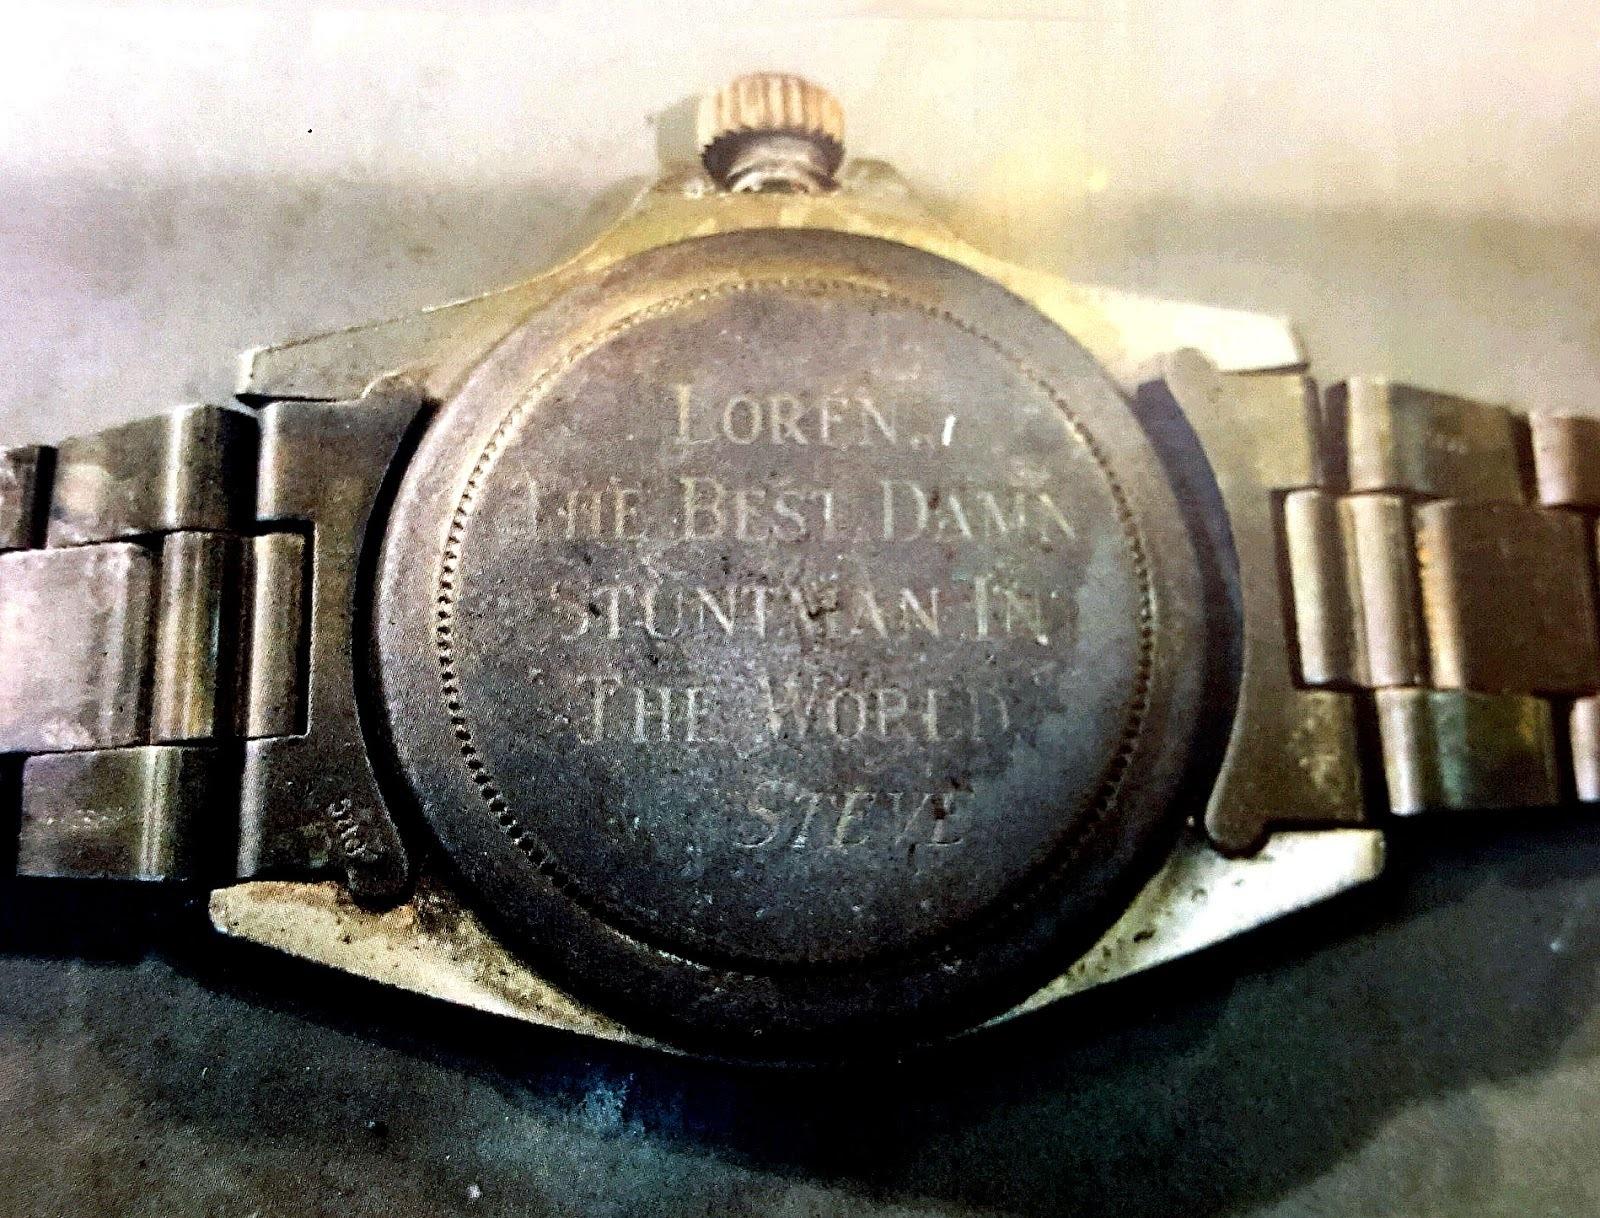 Loren-Janes-Submariner-with-Steve-McQueen-Engraving-after-fire.jpg